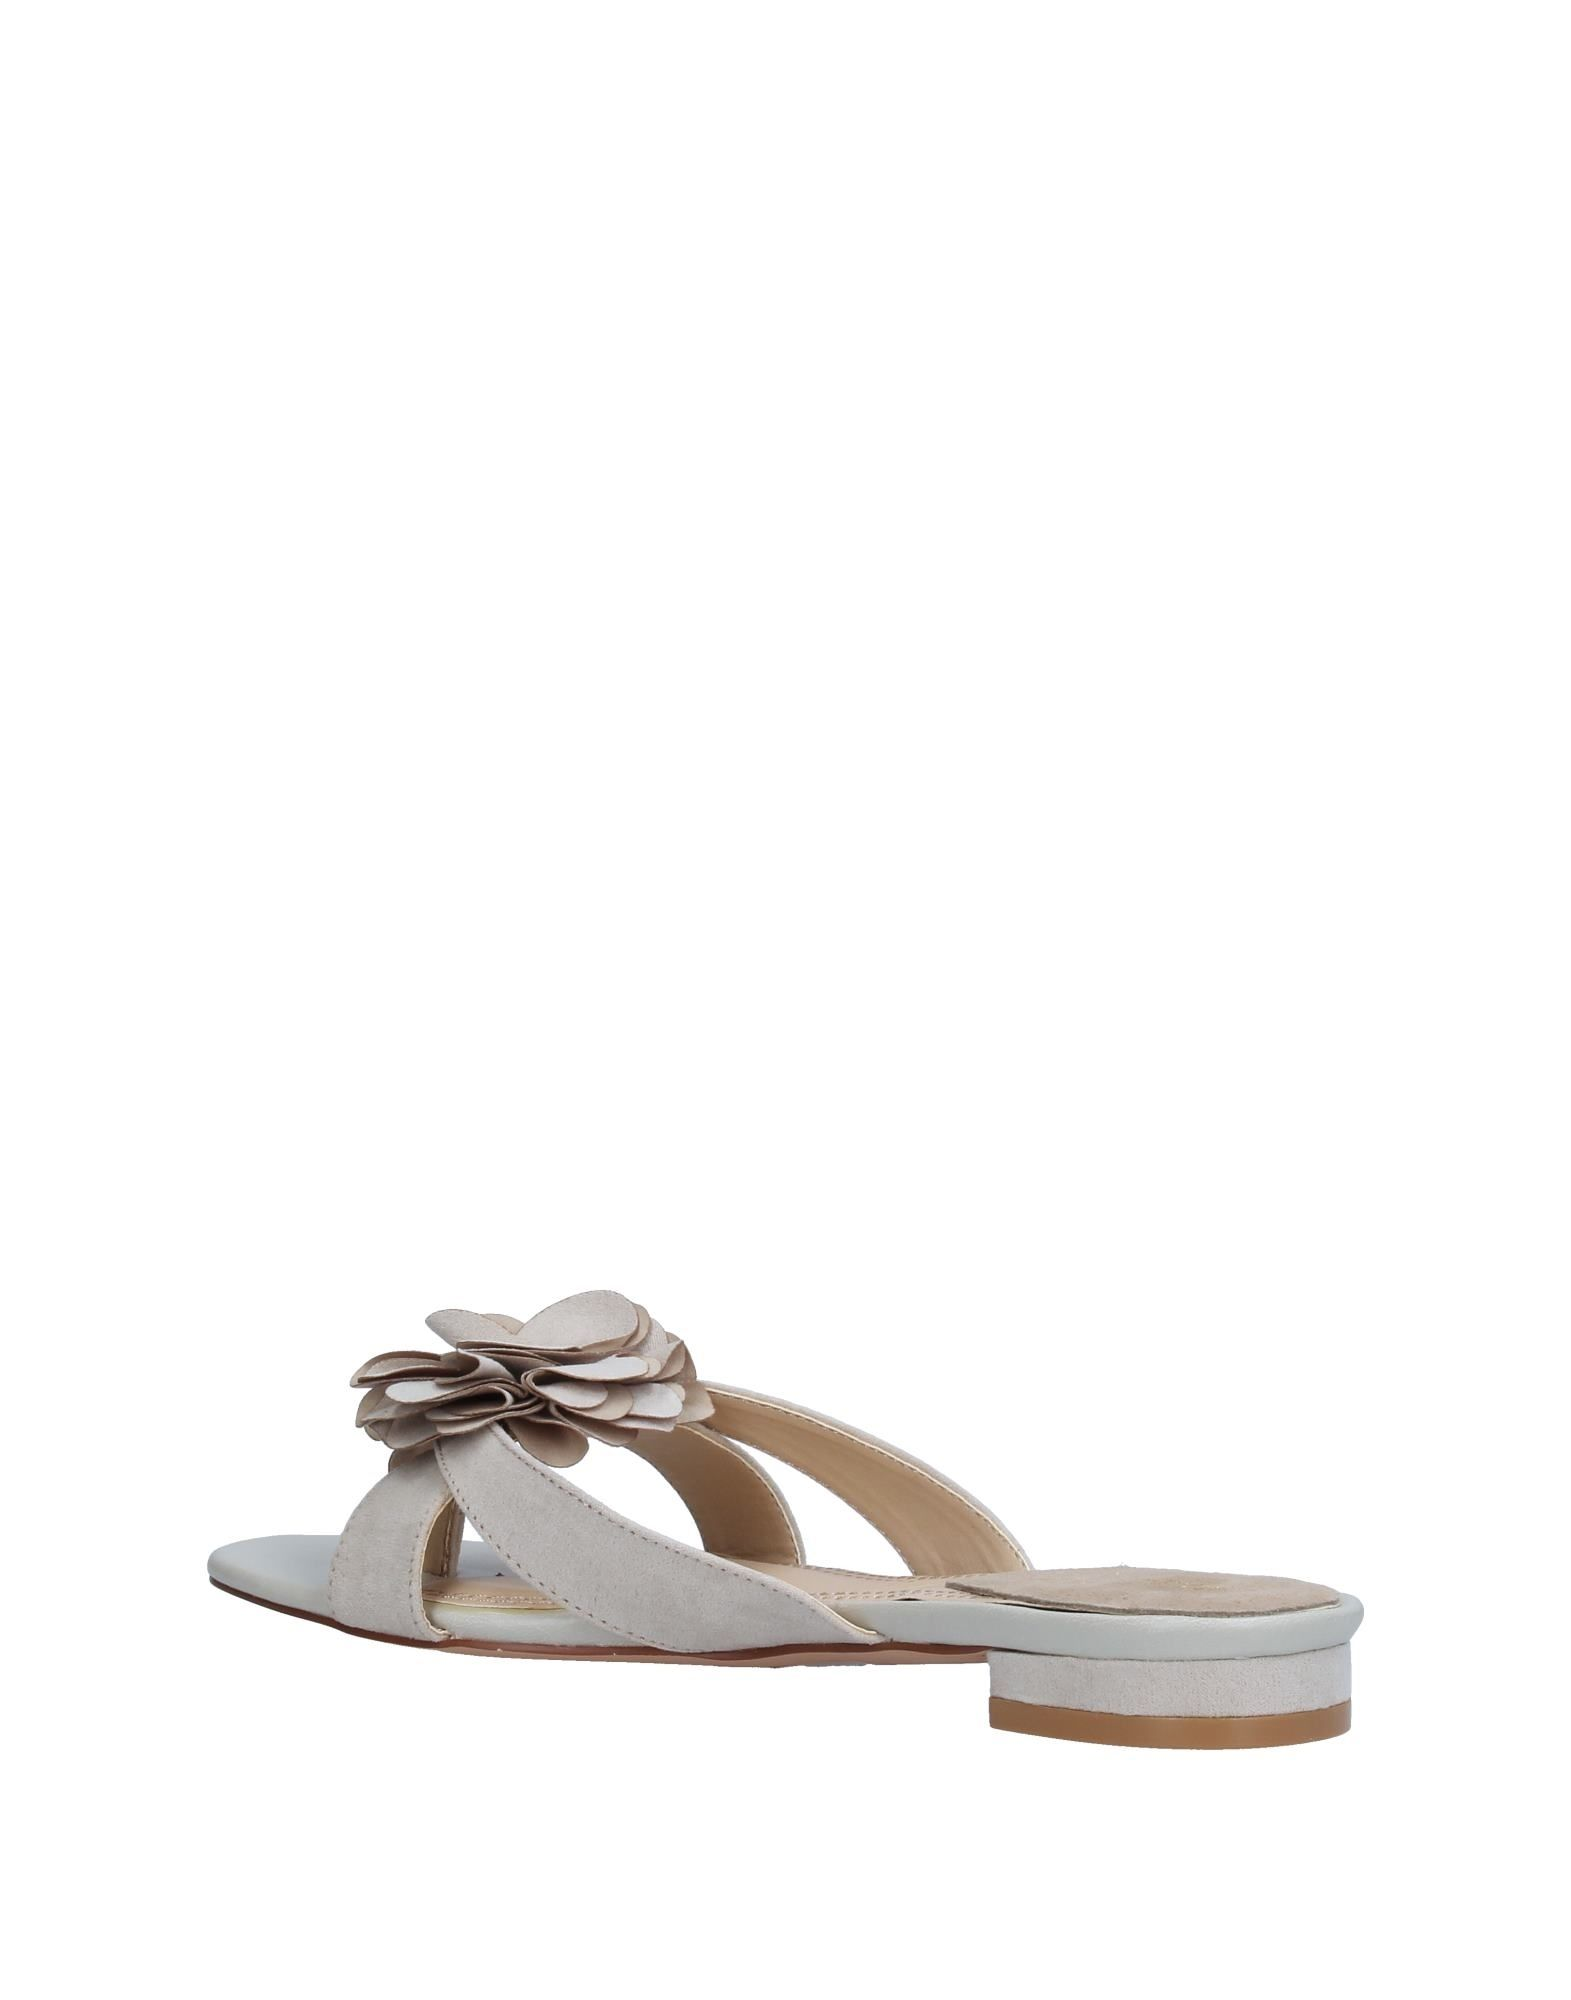 Alberto Moretti Dianetten Damen  11207318OB Gute Qualität beliebte Schuhe